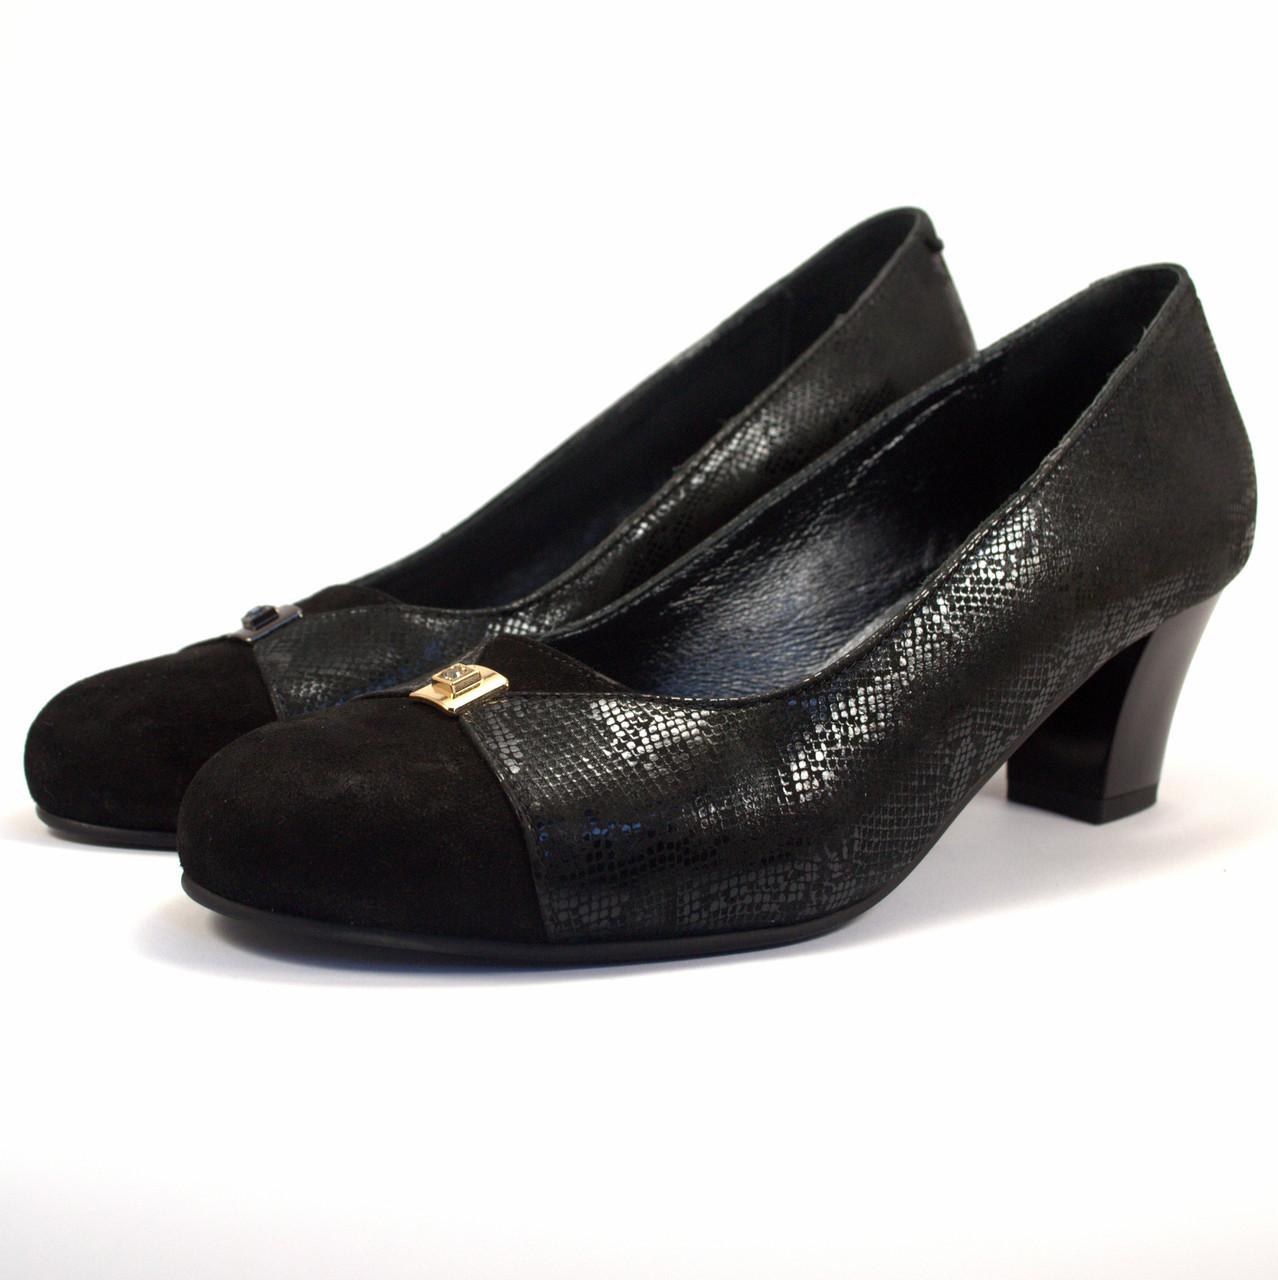 Туфли лодочка женская обувь Pyra Gold Black Lether Scales by Rosso Avangard кожаные